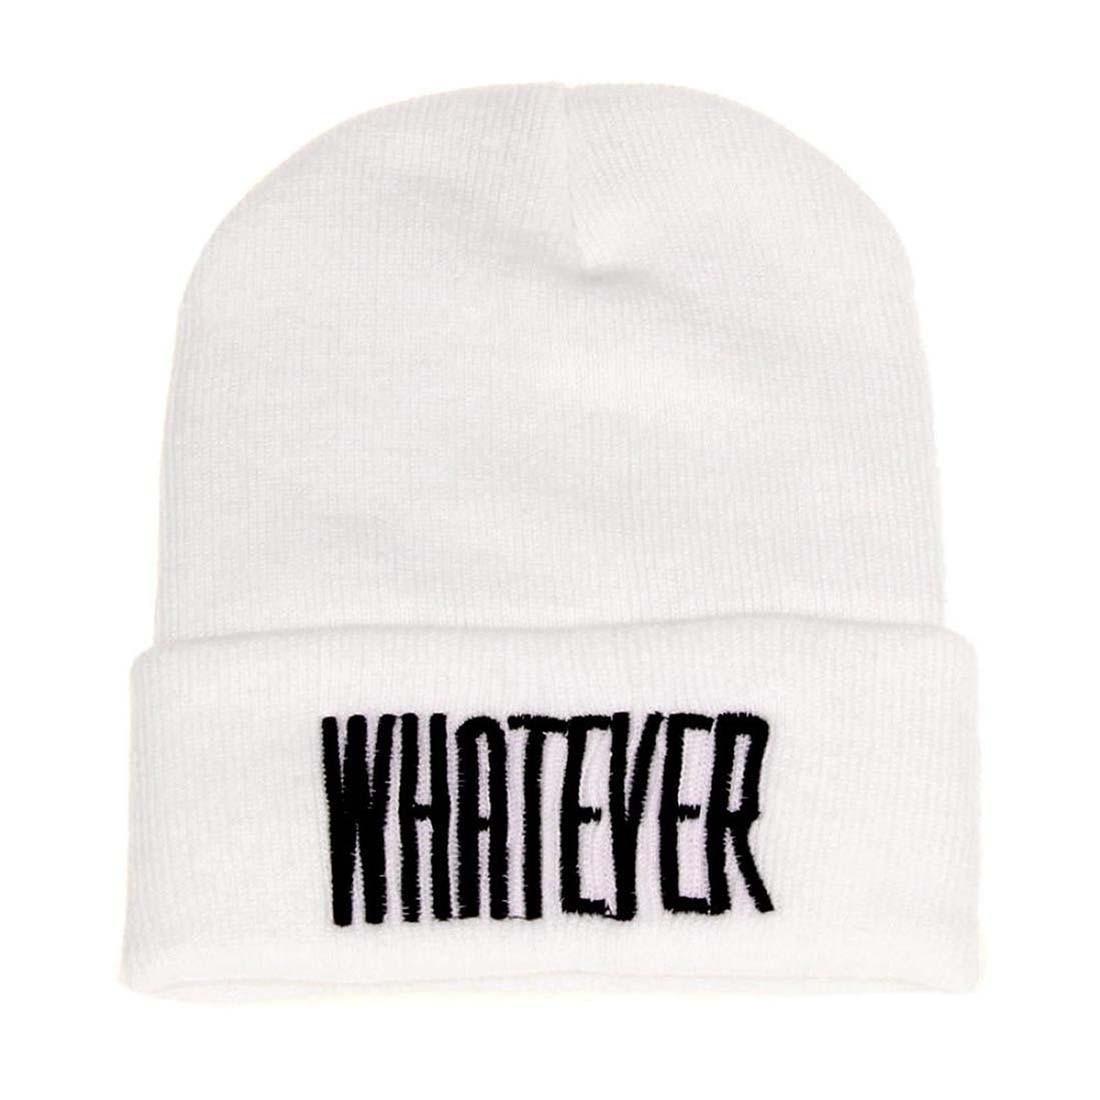 New Winter Whatever Beanie Hat And Snapback Men And Women Cap (White) shocking show 2016 new design winter black whatever beanie hat and snapback men and women cap